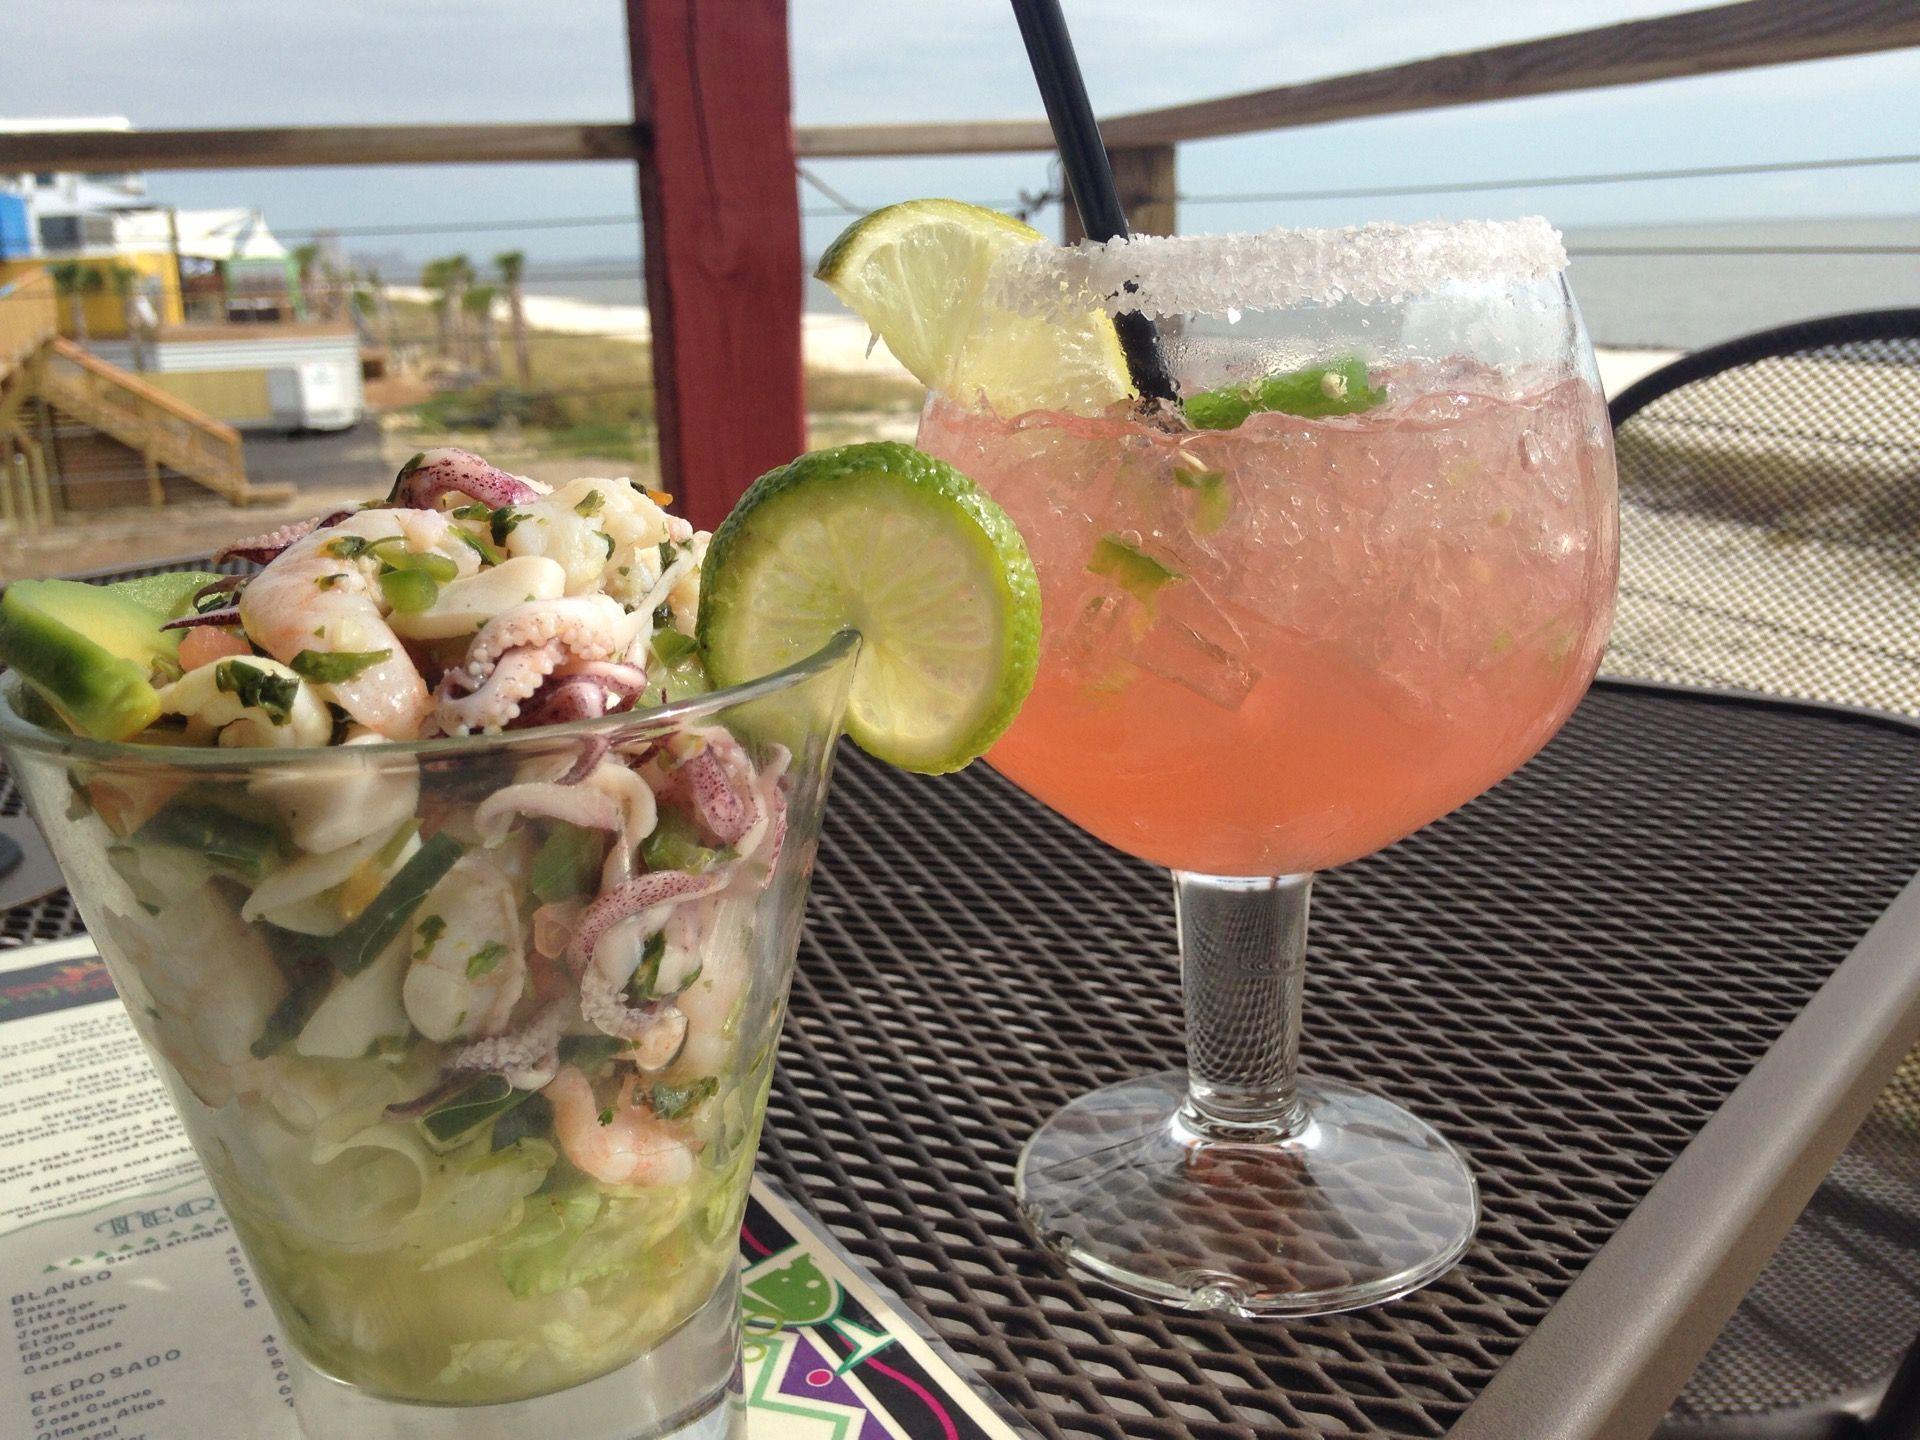 Baja Beach Biloxi Seafood Trail In 2019 Biloxi Beach